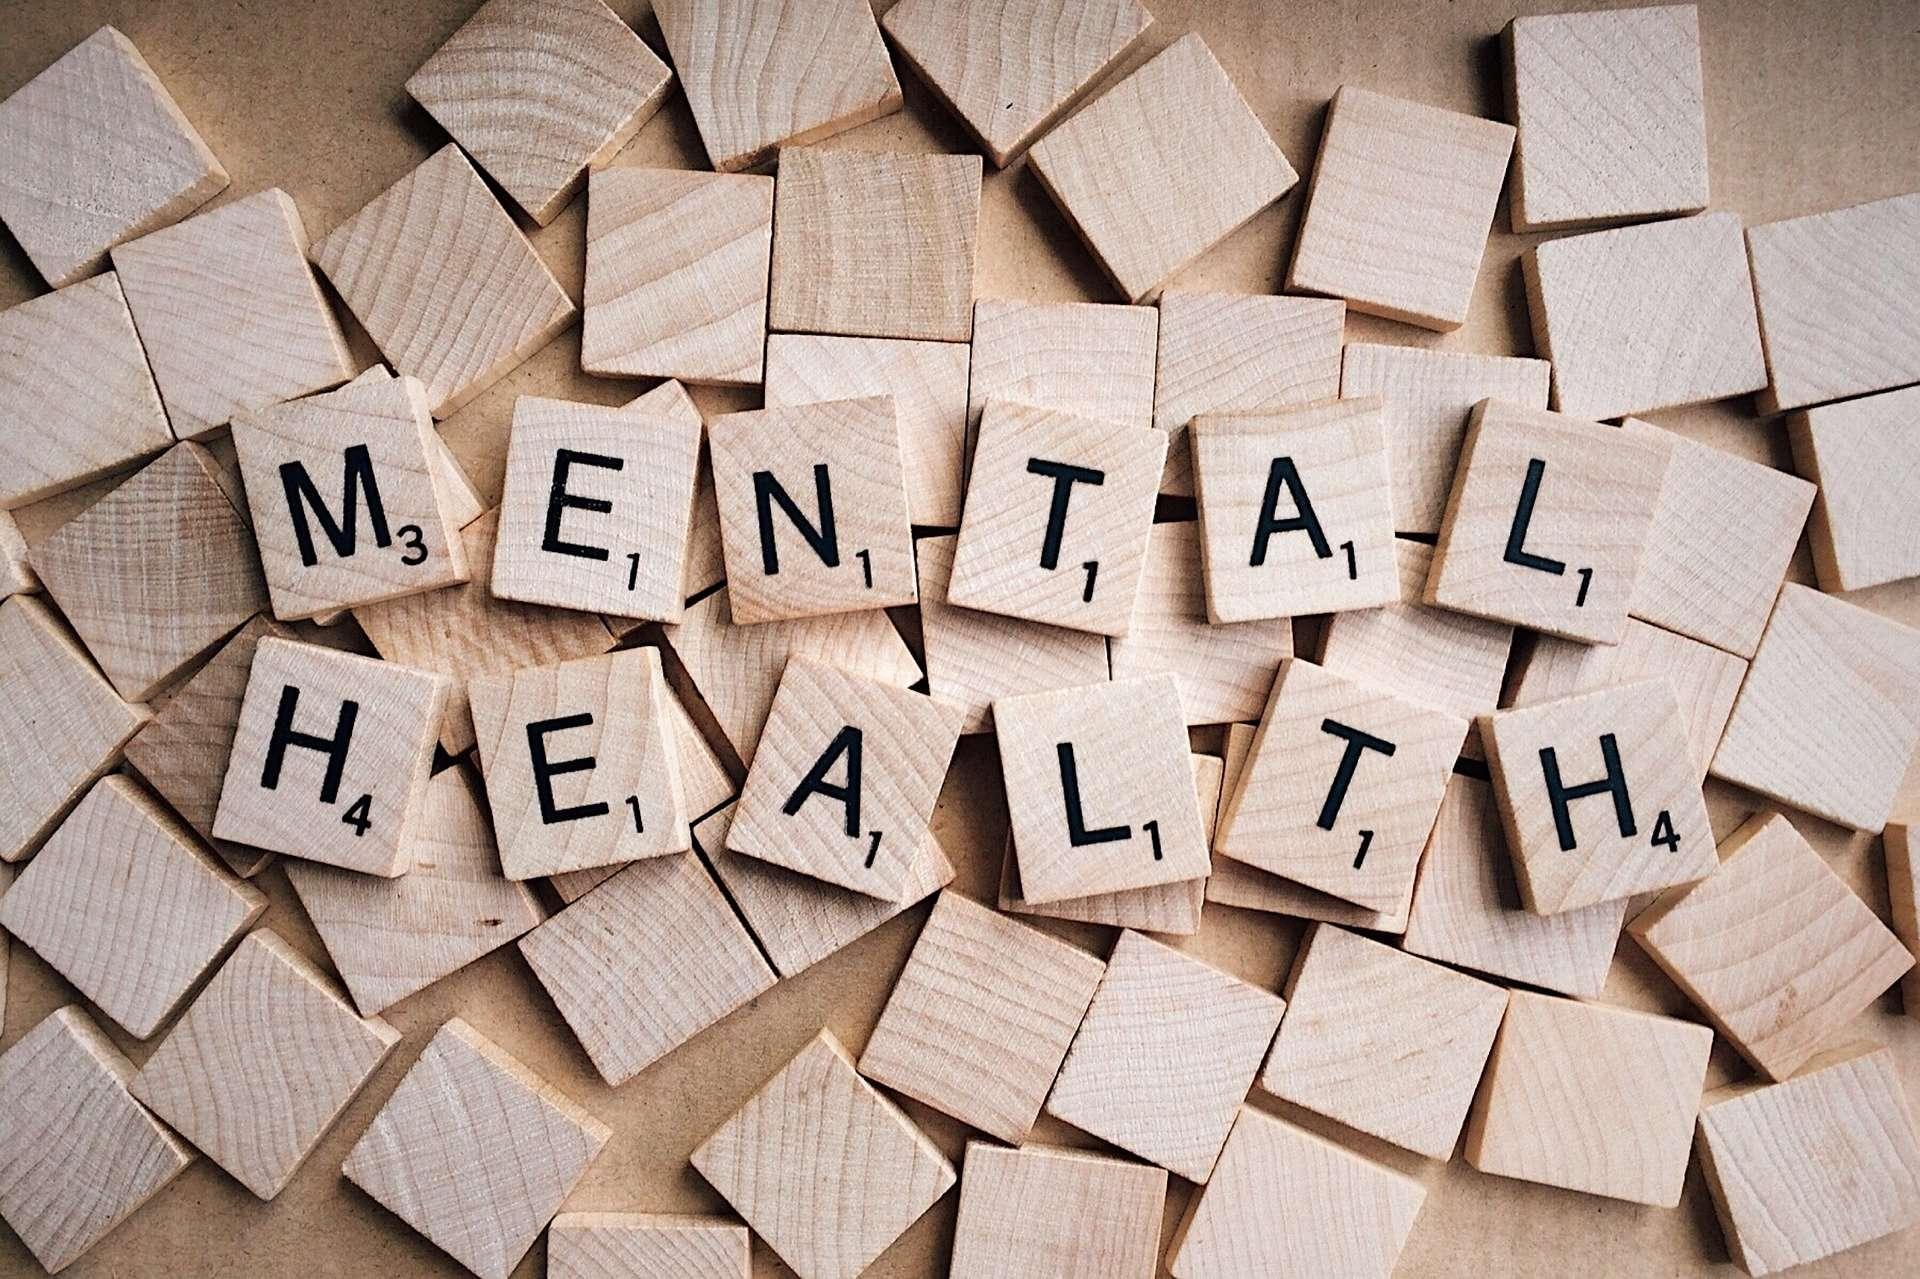 scrabble pieces of mental health